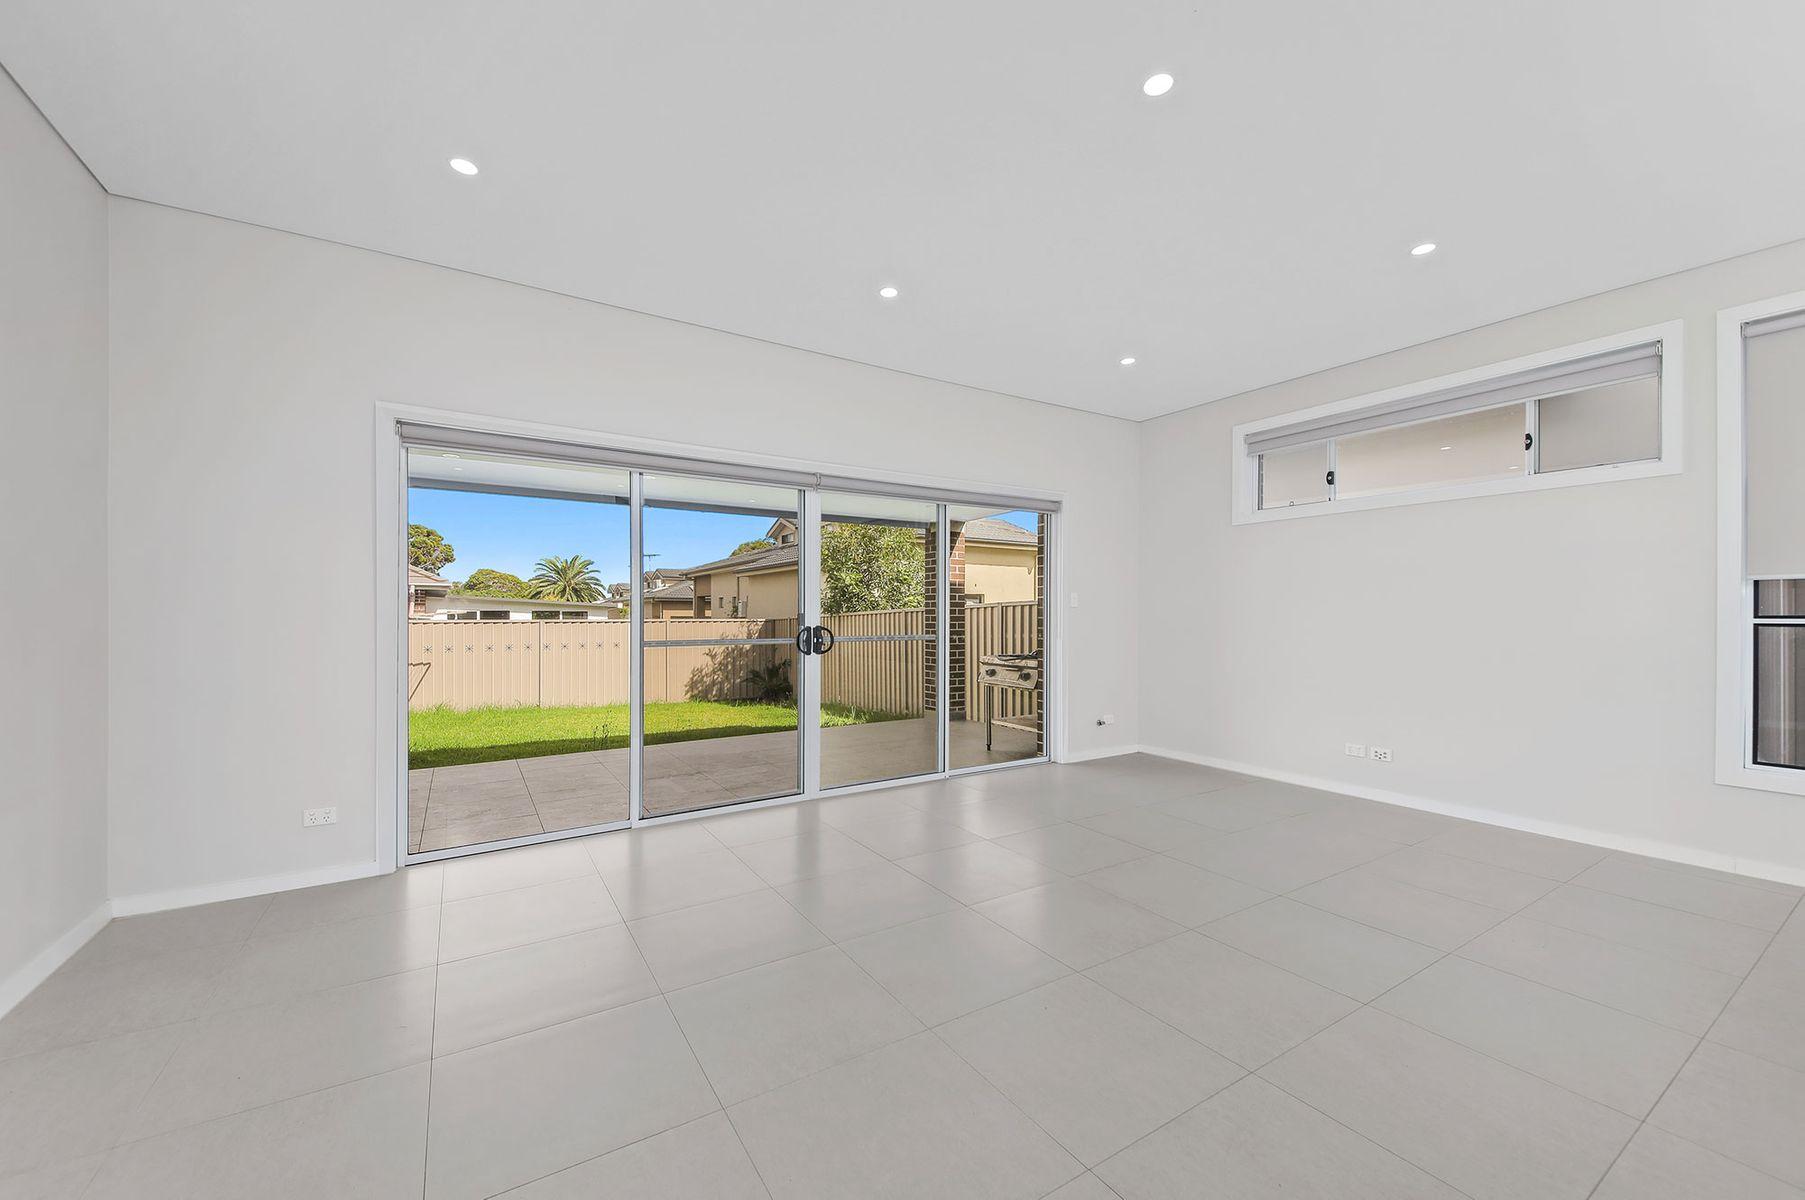 24 Ellis St, Condell Park, NSW 2200